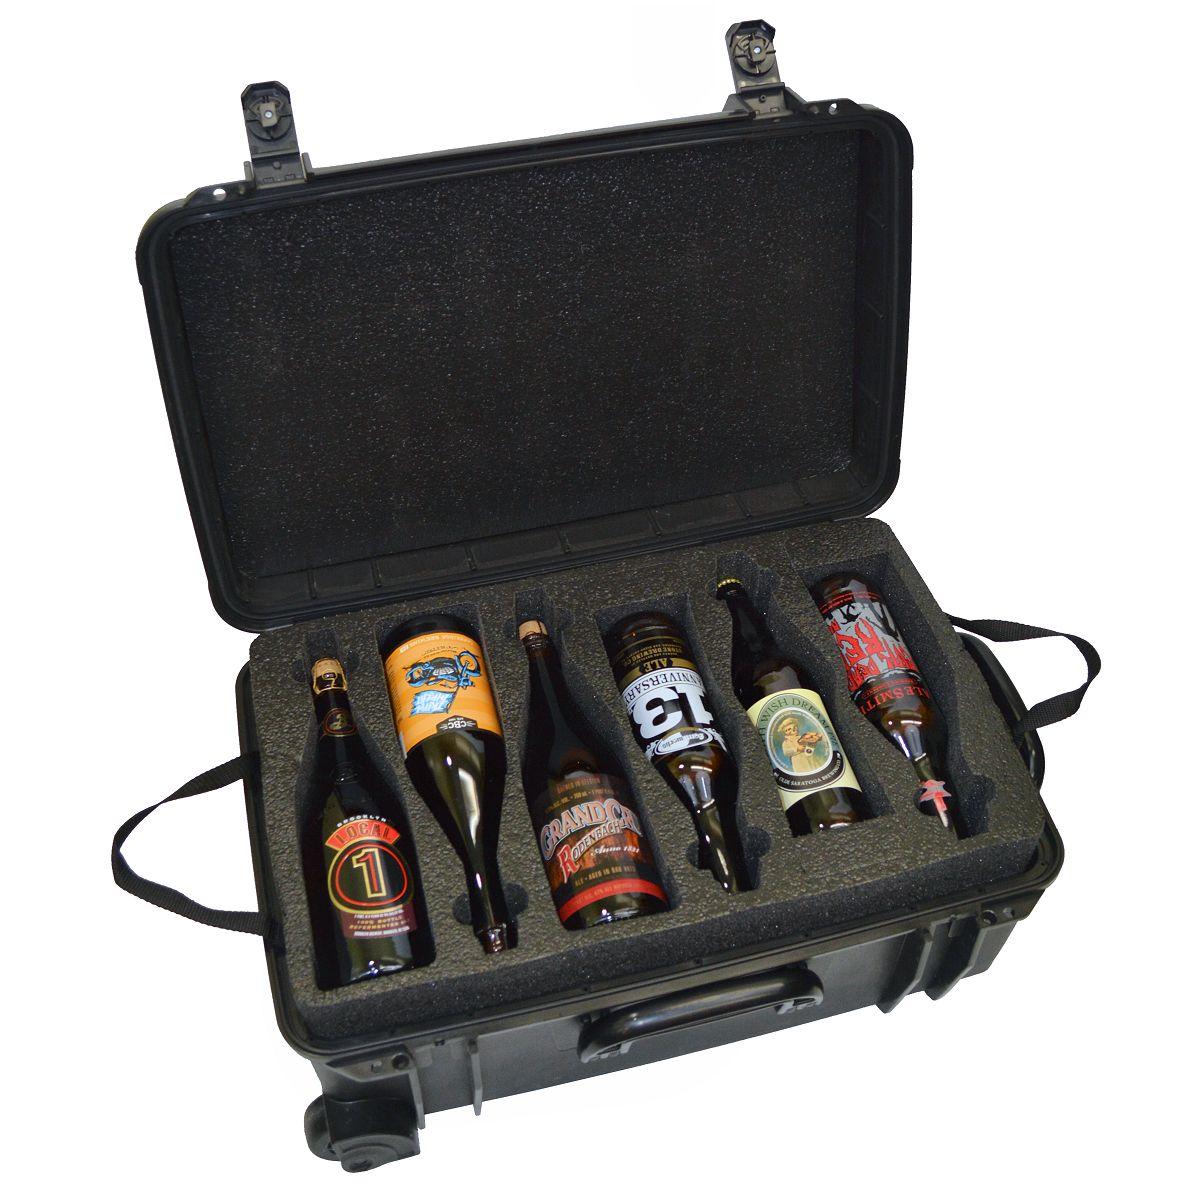 Seahorse SE-920 BC Beer Traveler 12 Custom Foam Case - Top Level